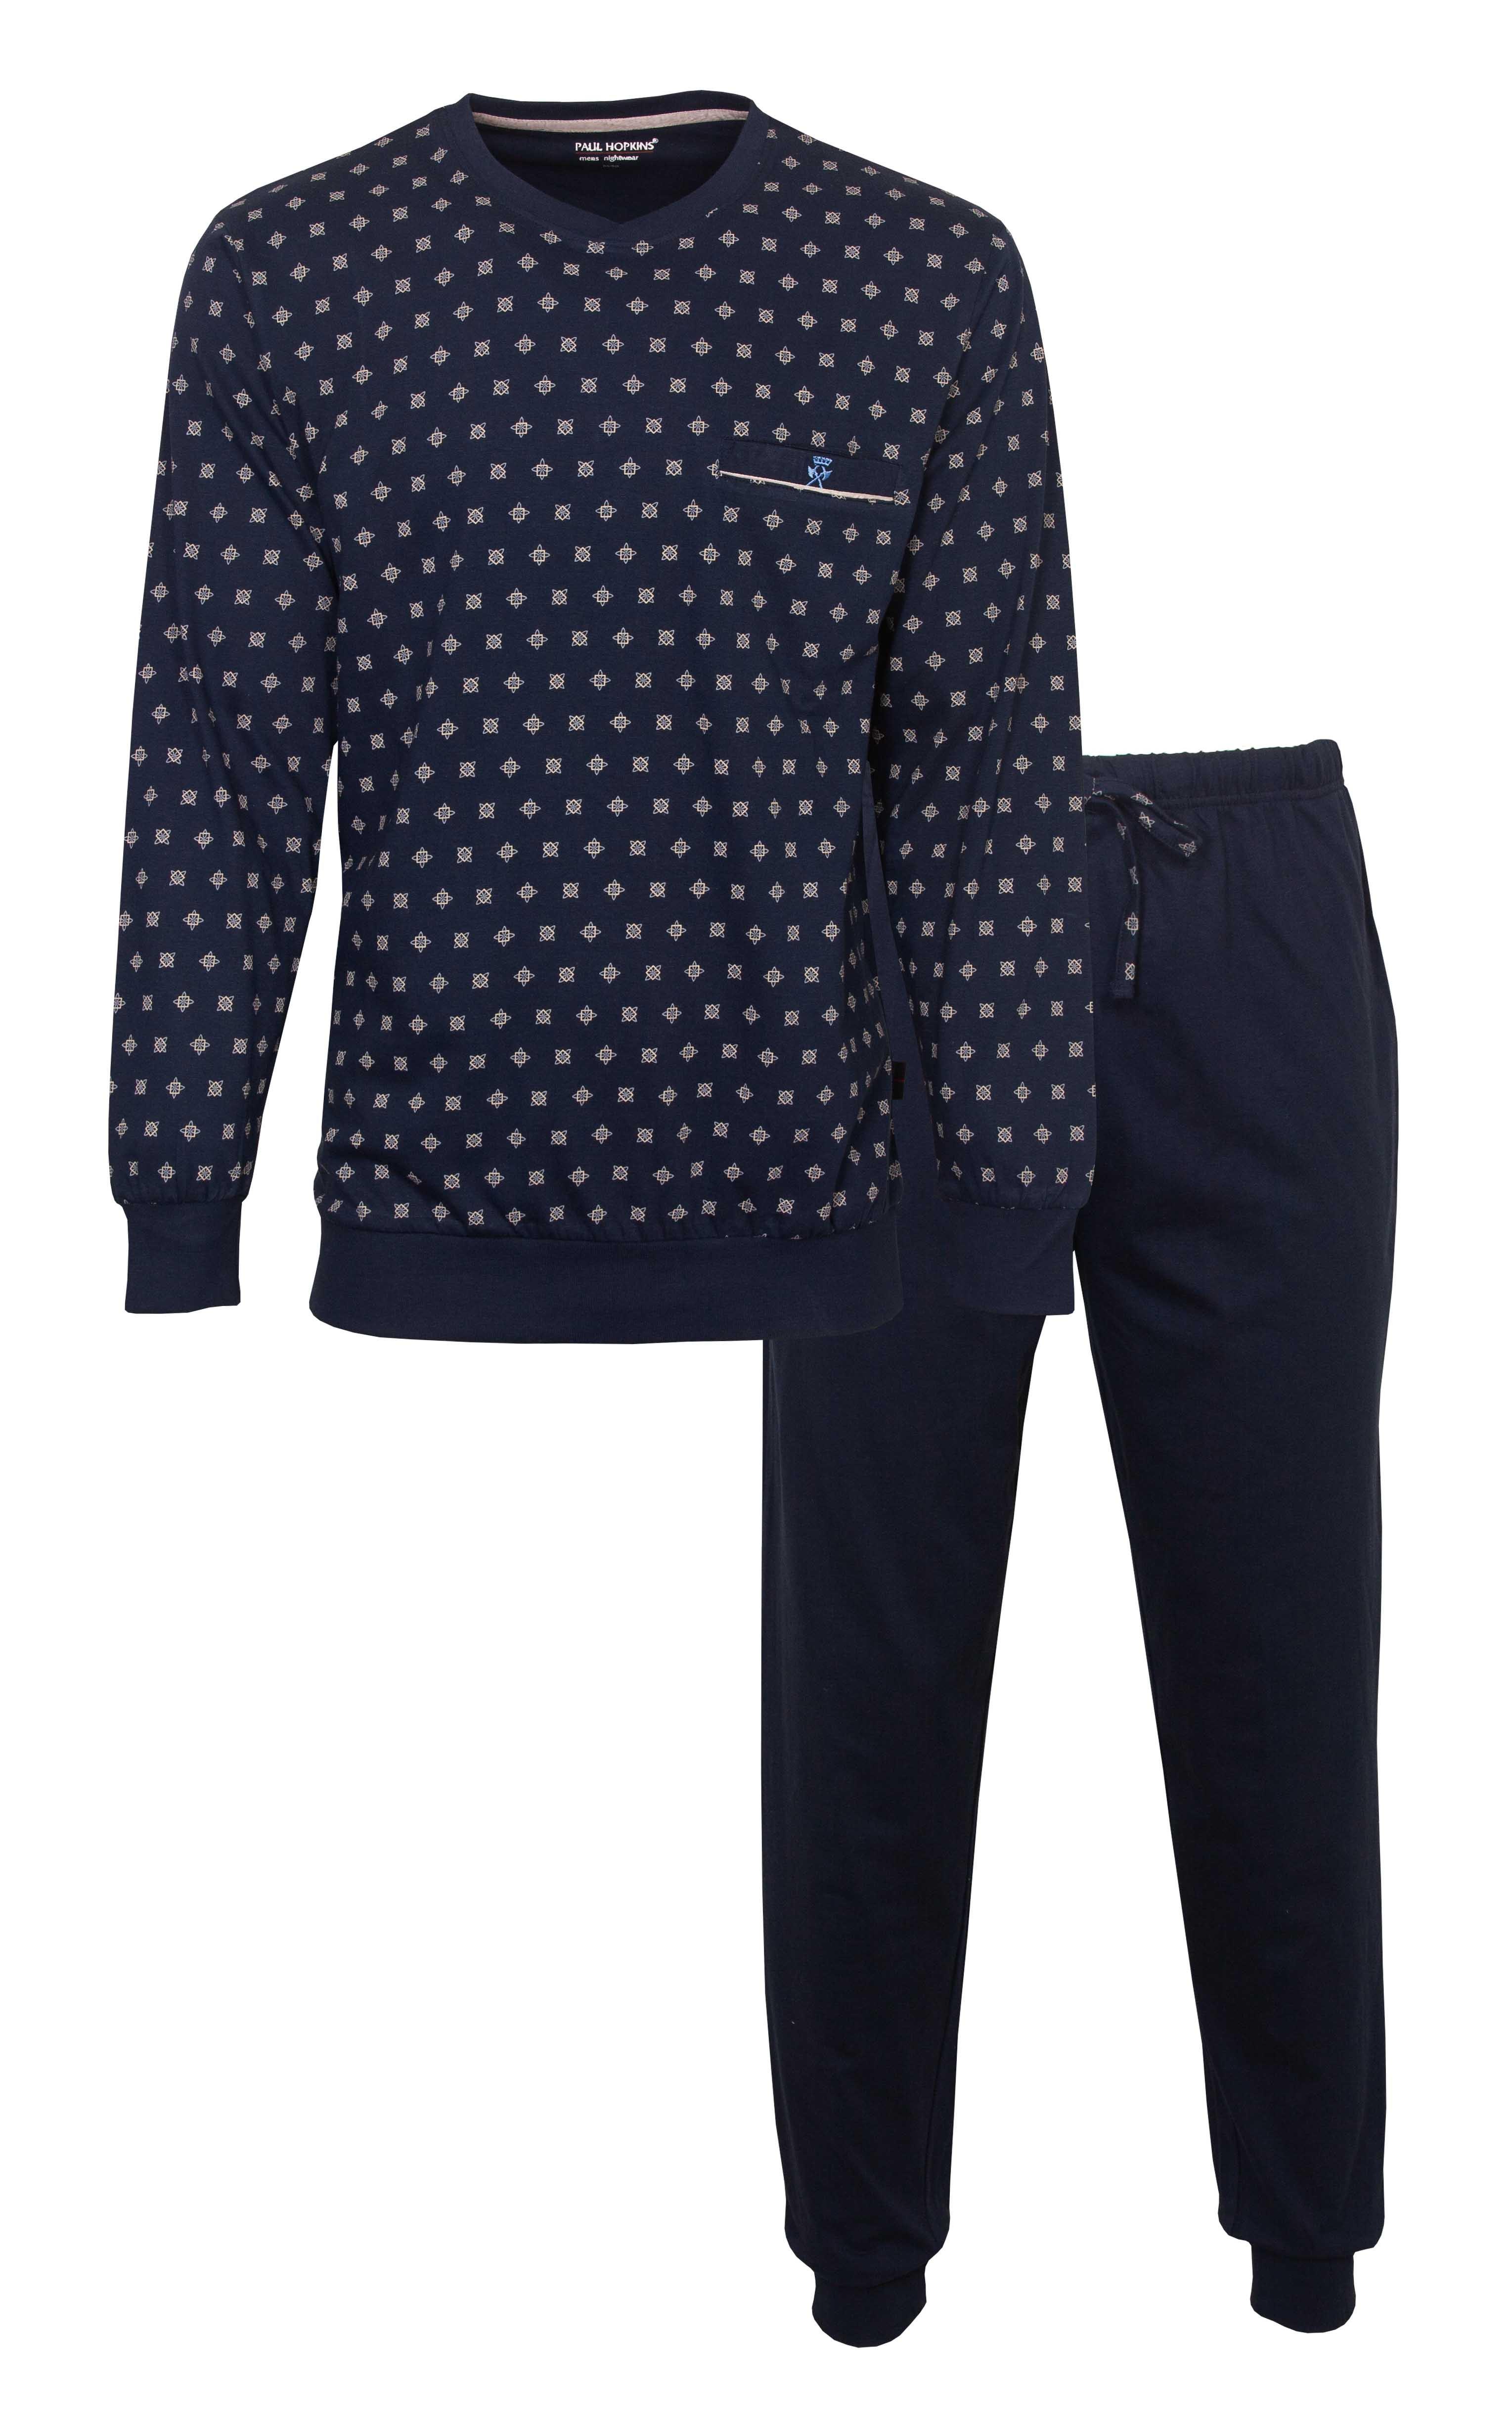 Heren pyjama PHPYH 1101A-3XL/58